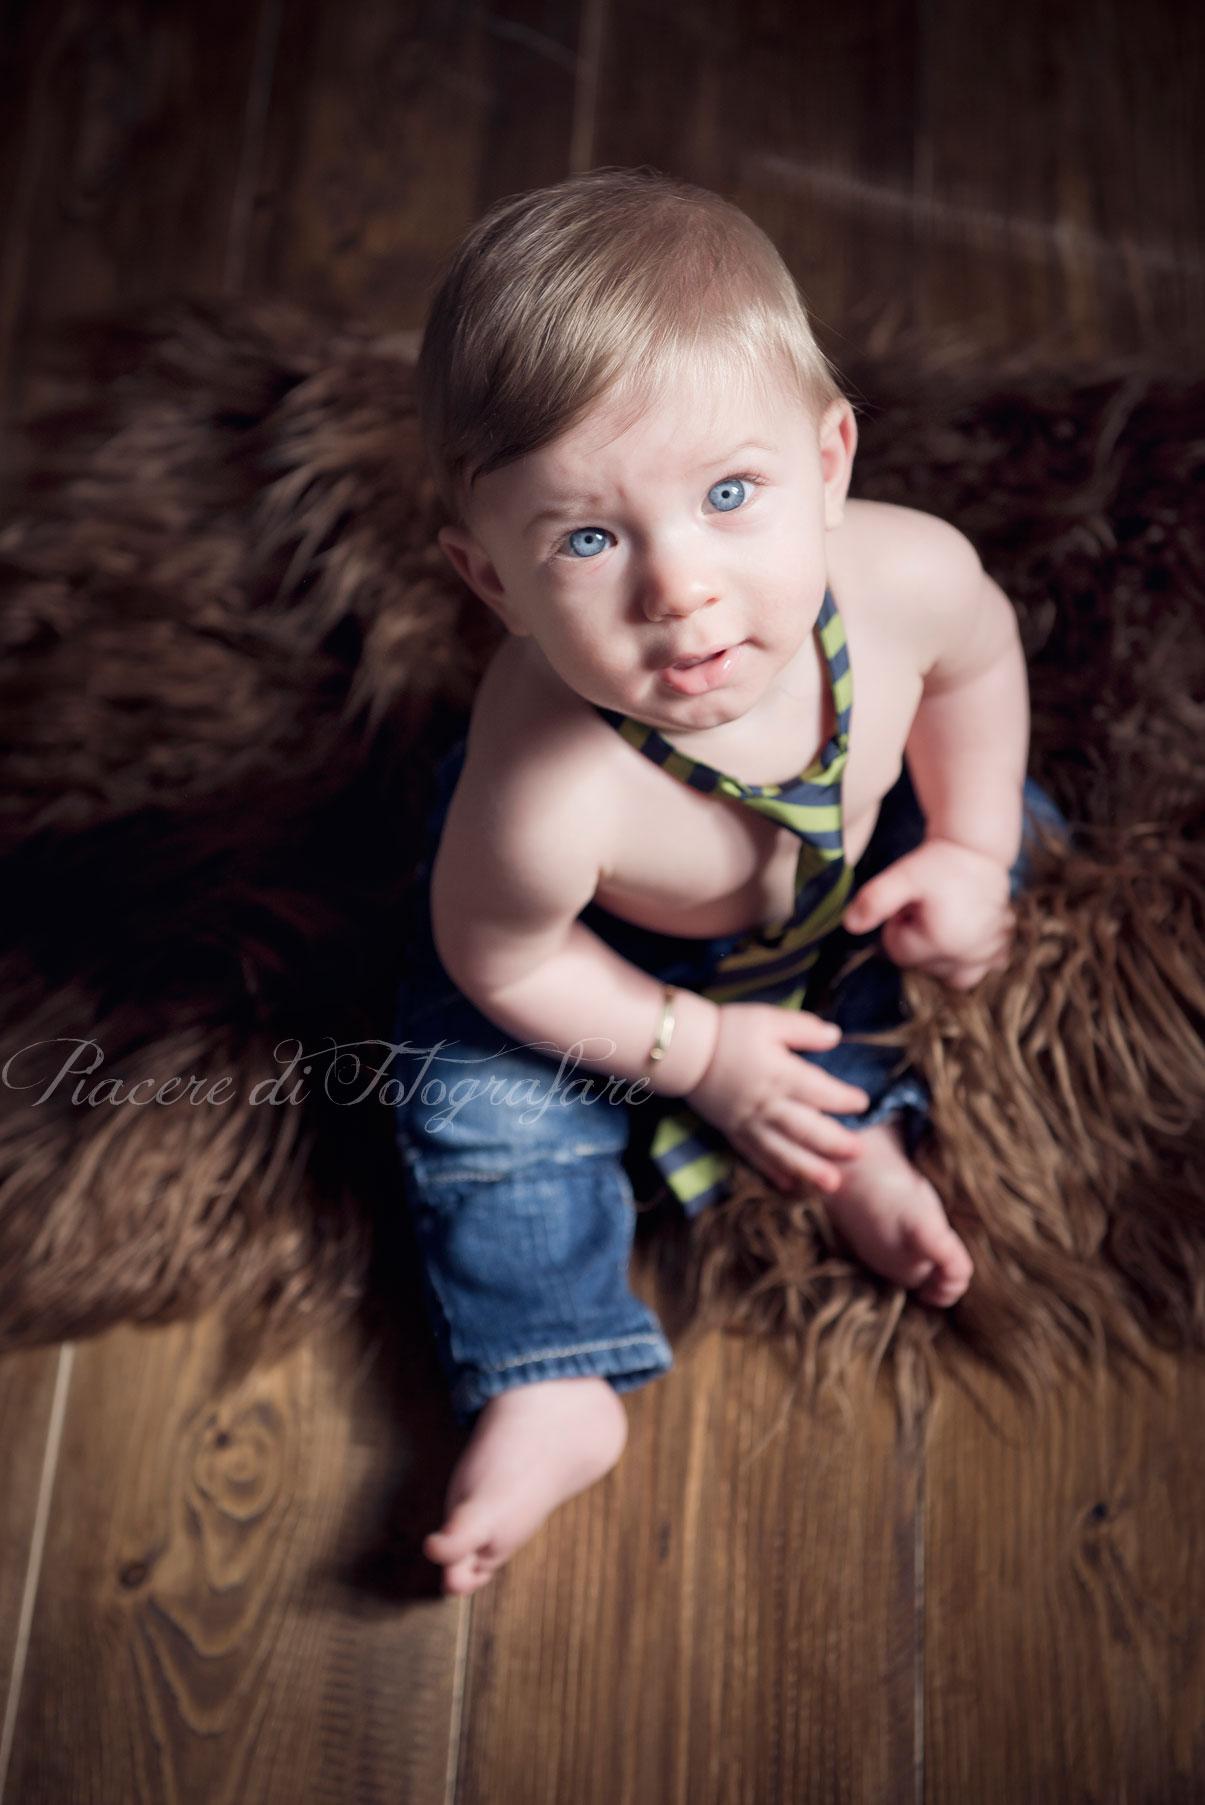 Ben noto Racconto servizio fotografico bambino Roma Mattia KB41